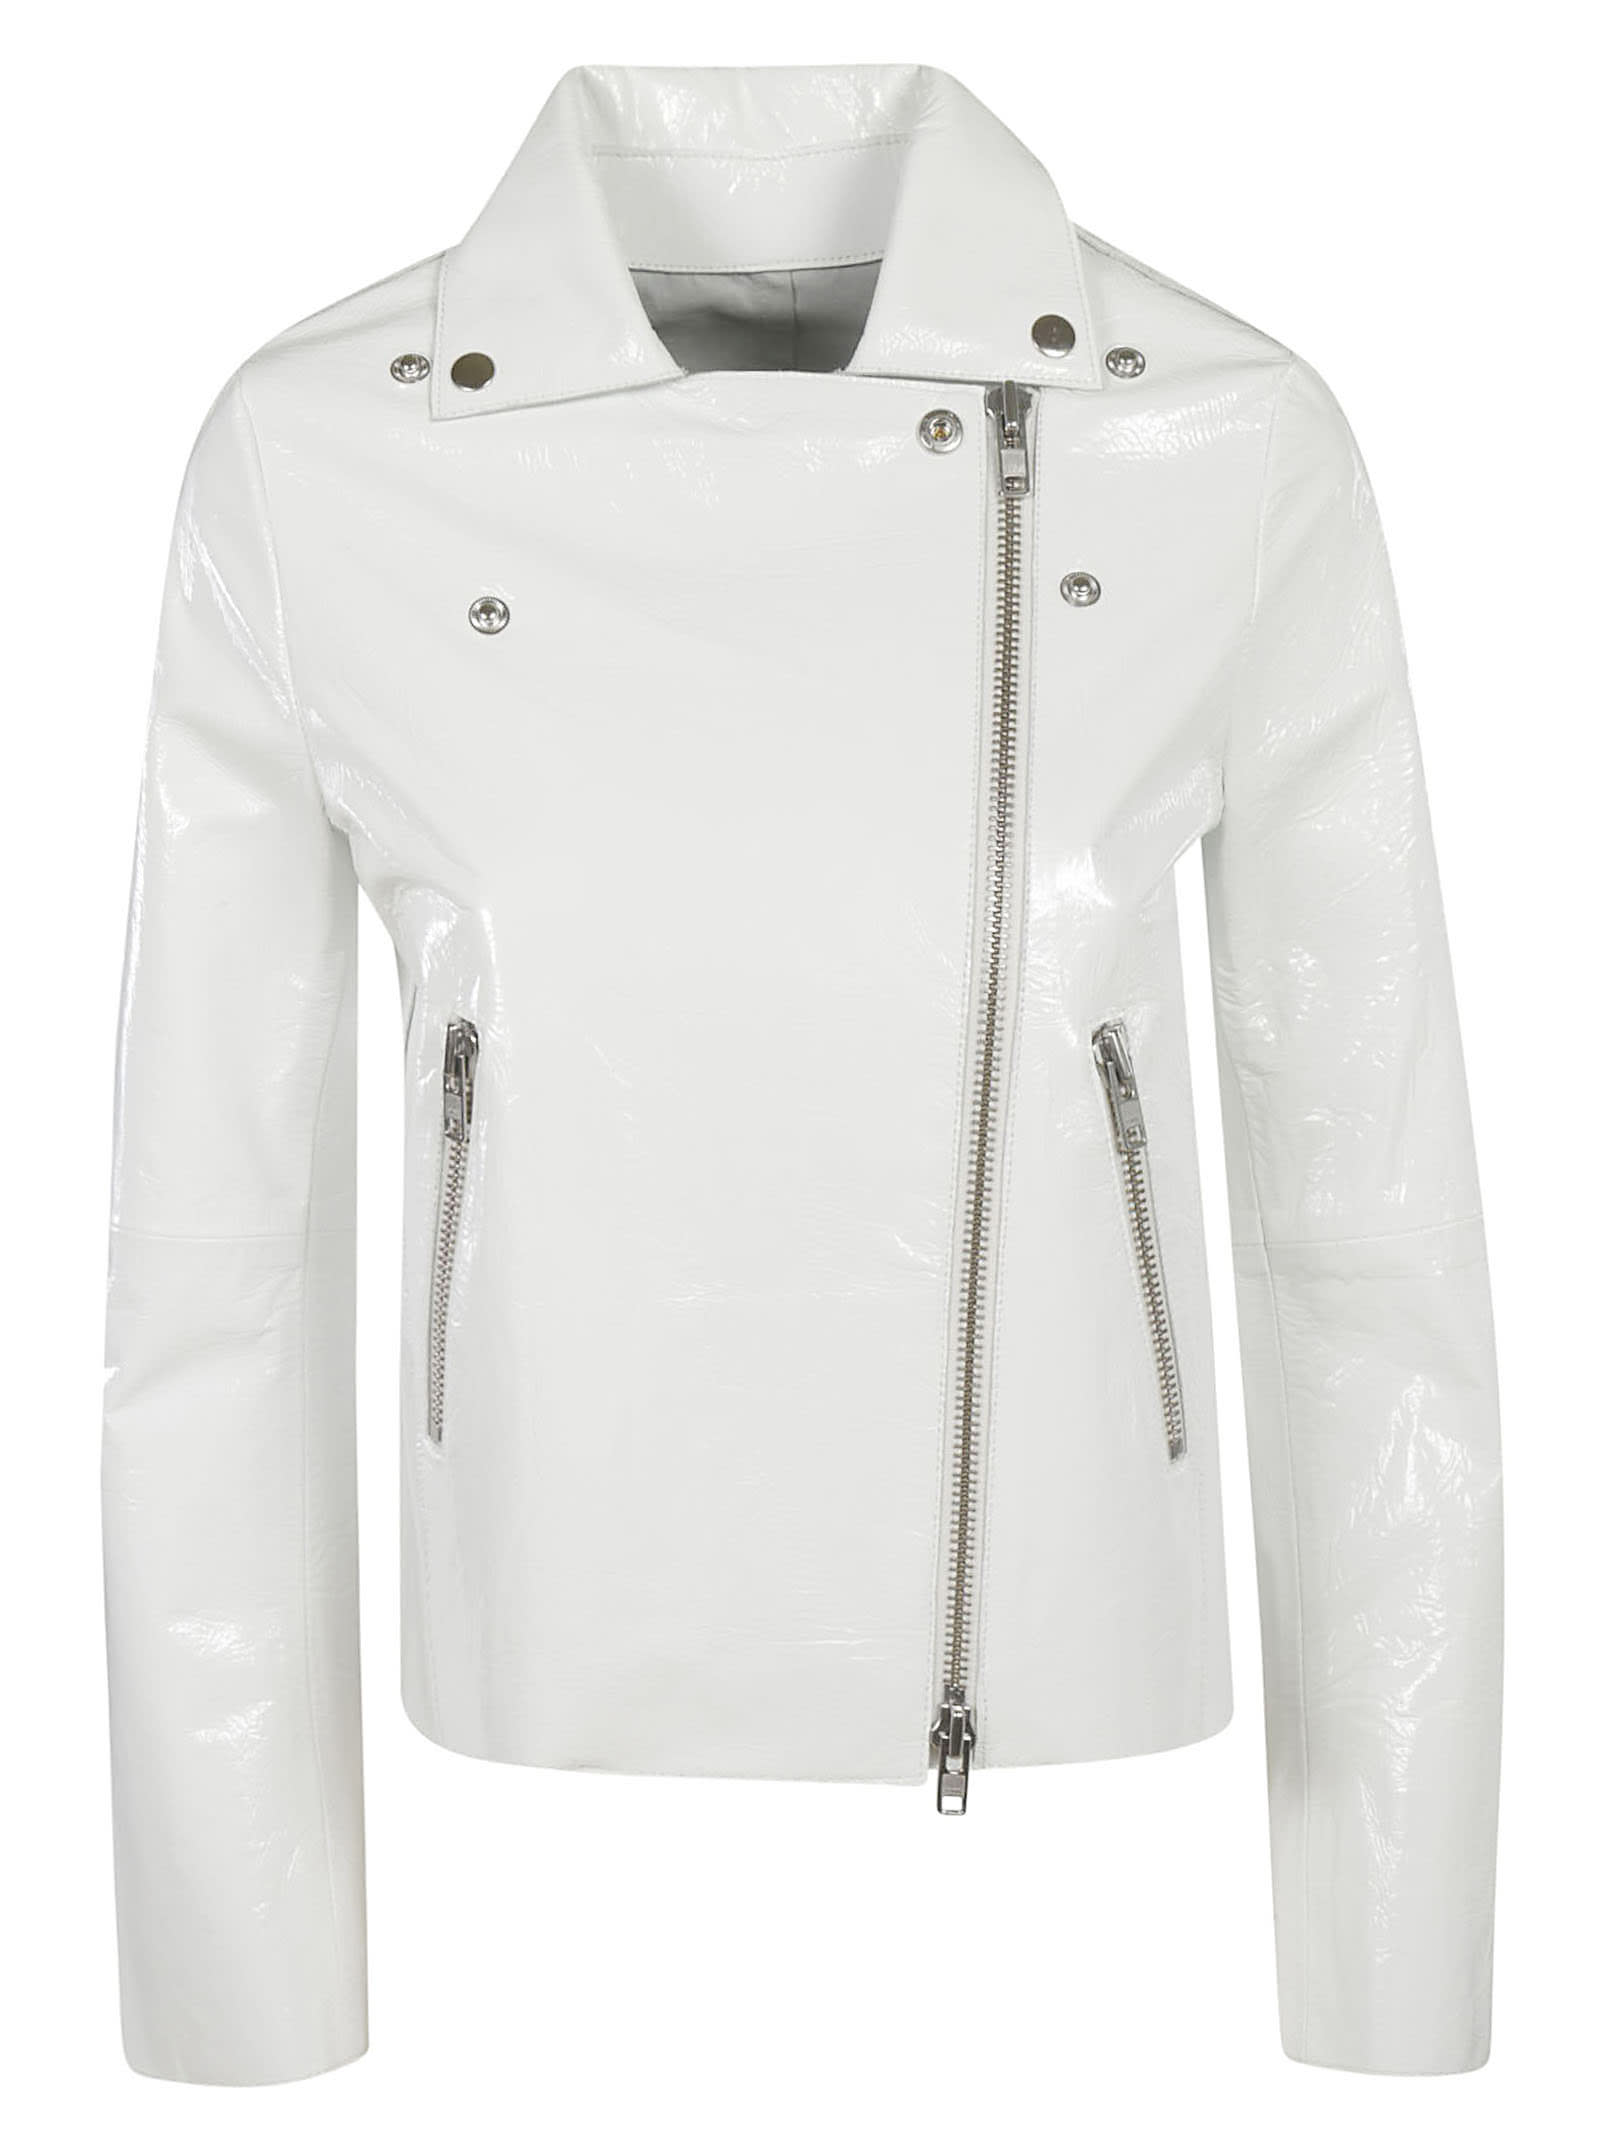 S.W.O.R.D 6.6.44 Classic Zipped Biker Jacket